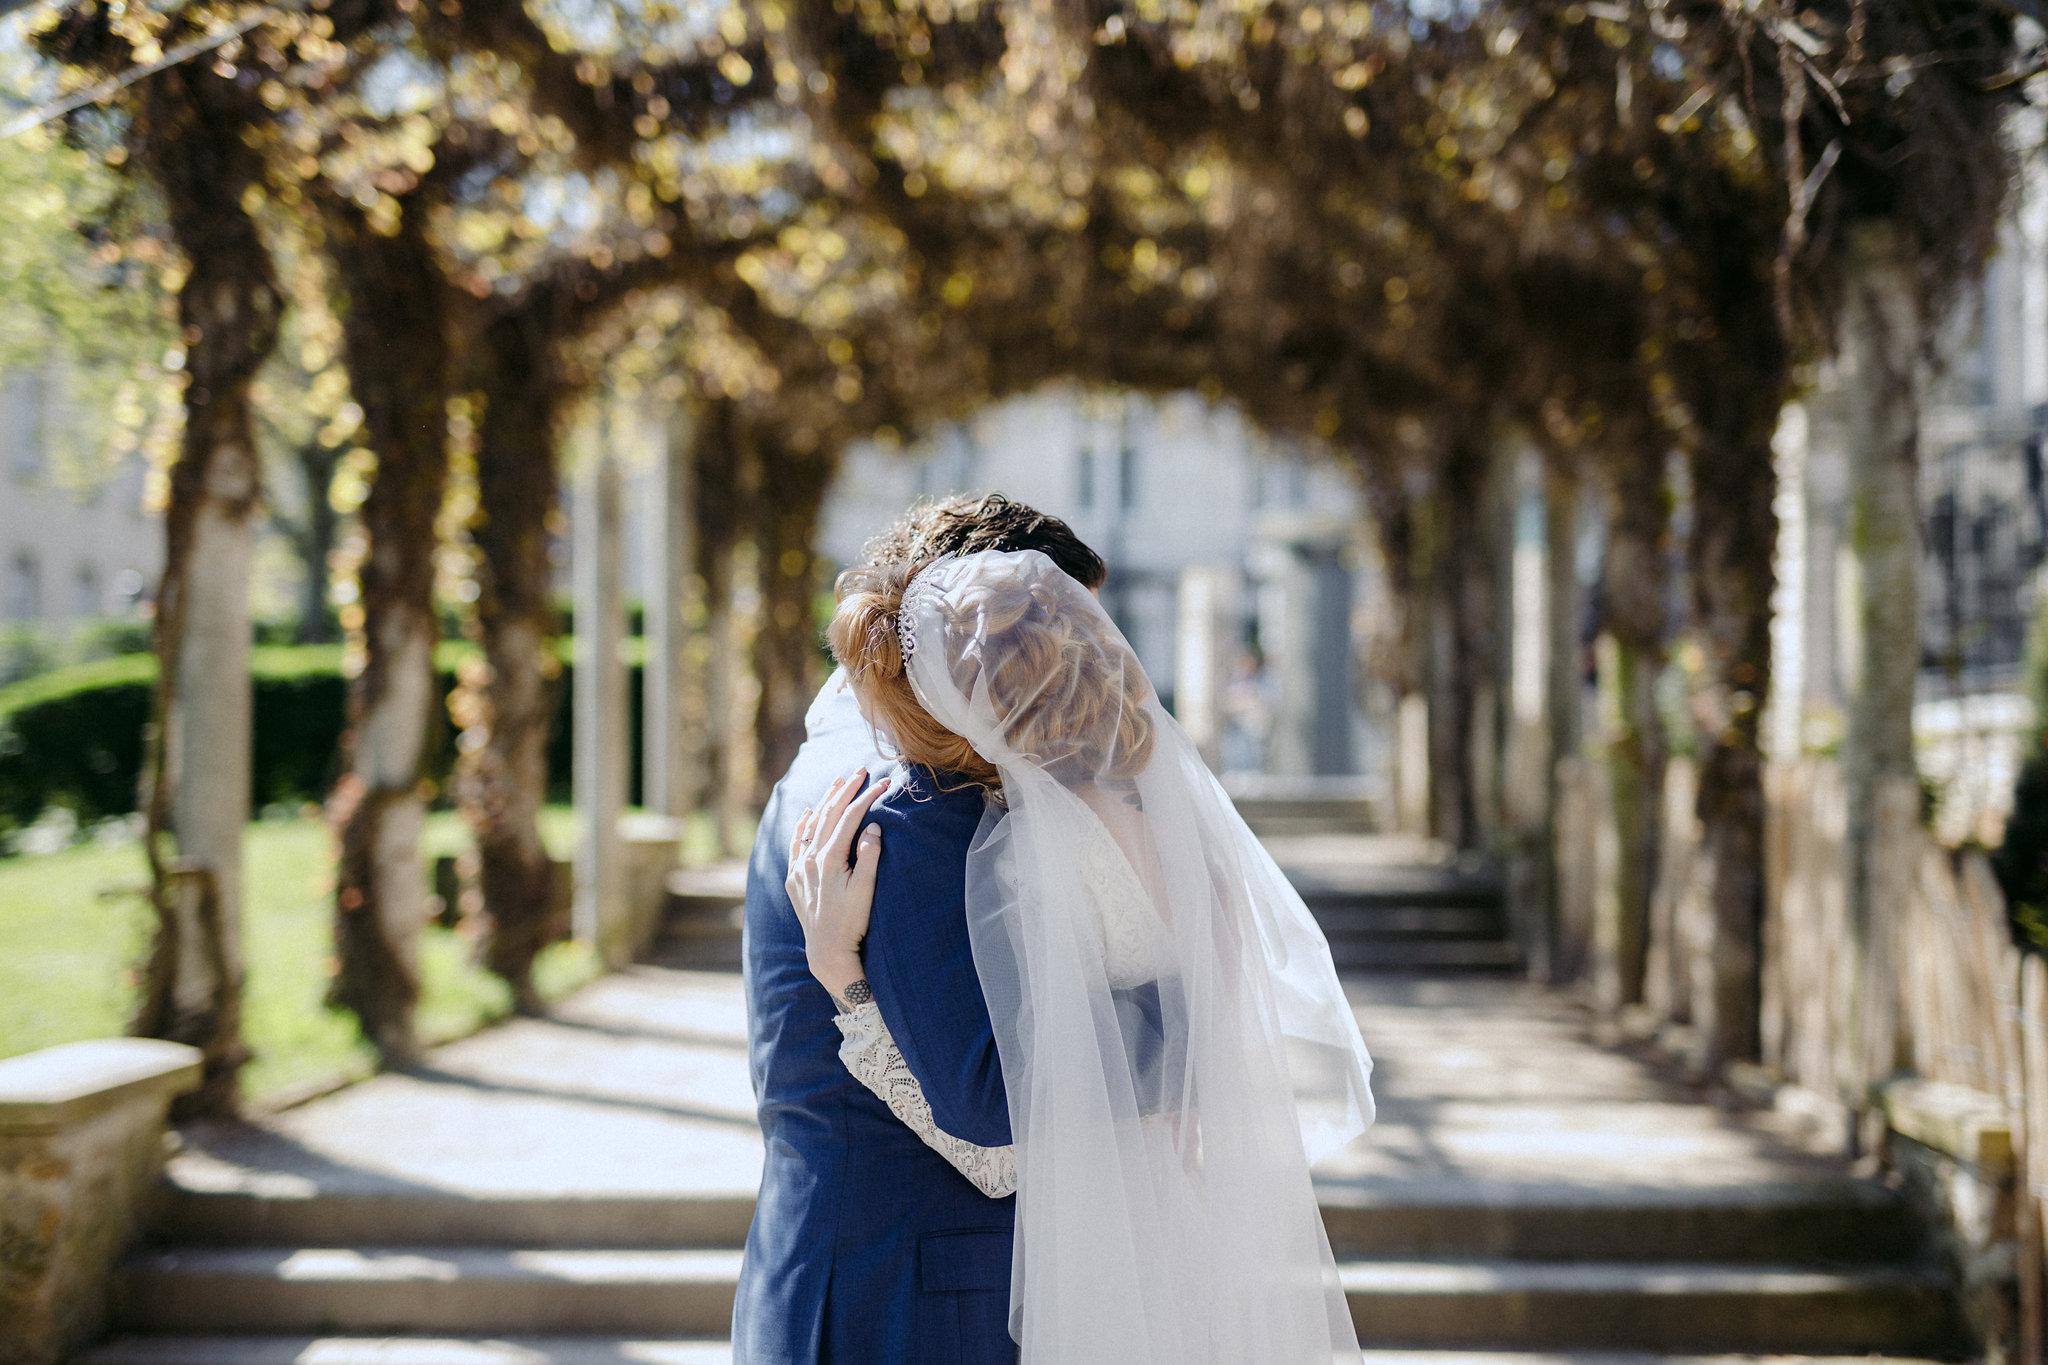 Paris_elopement_wedding_photographer-207.jpg